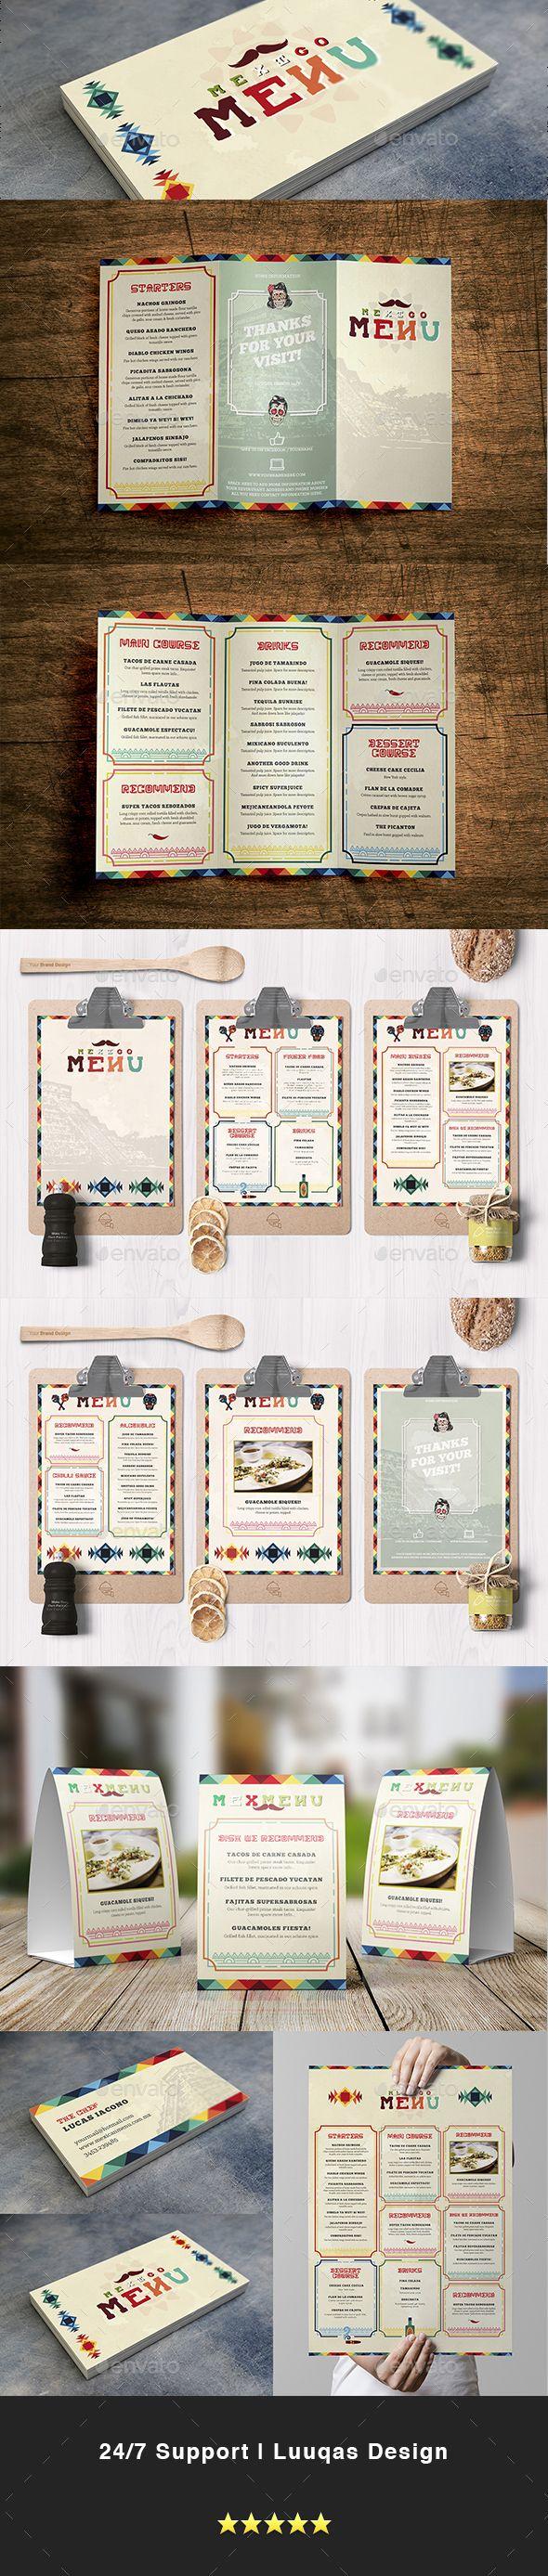 Mexican Food Menu Template - Food Menus Print Templates Download here : https://graphicriver.net/item/mexican-food-menu-template/17343241?s_rank=219&ref=Al-fatih